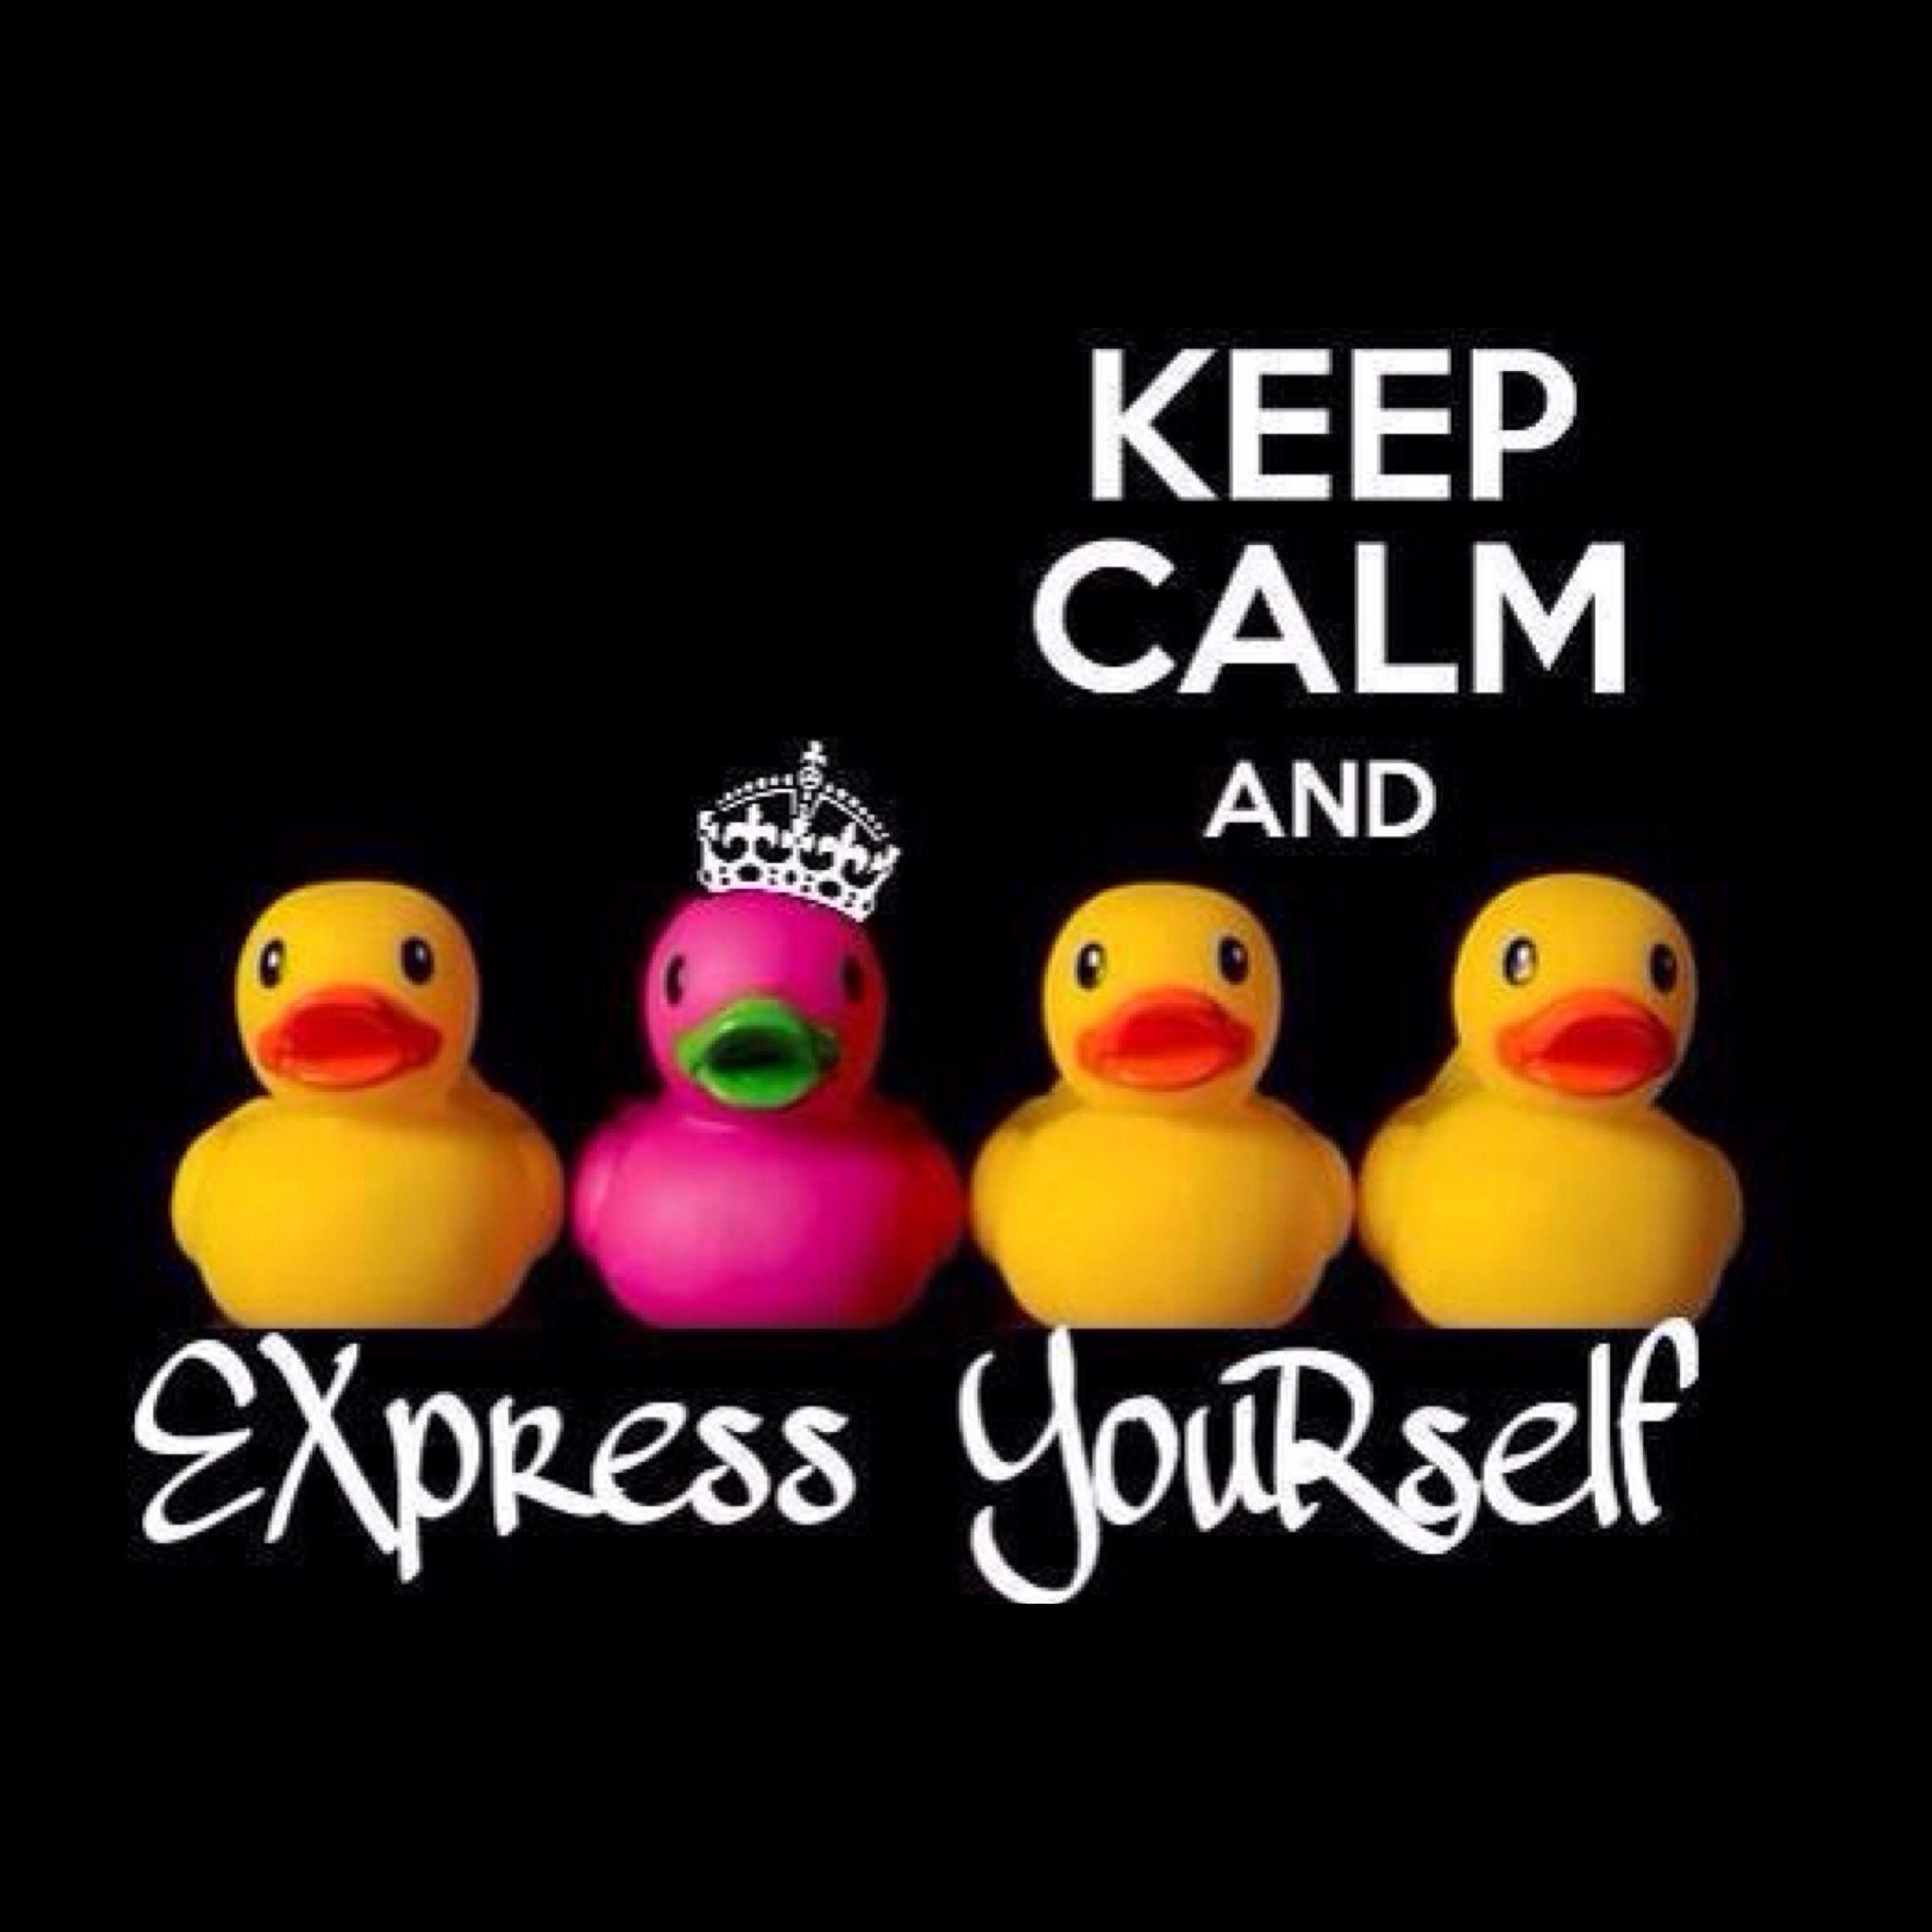 Express Yourelf Keep Calm Calm Keep Calm Signs